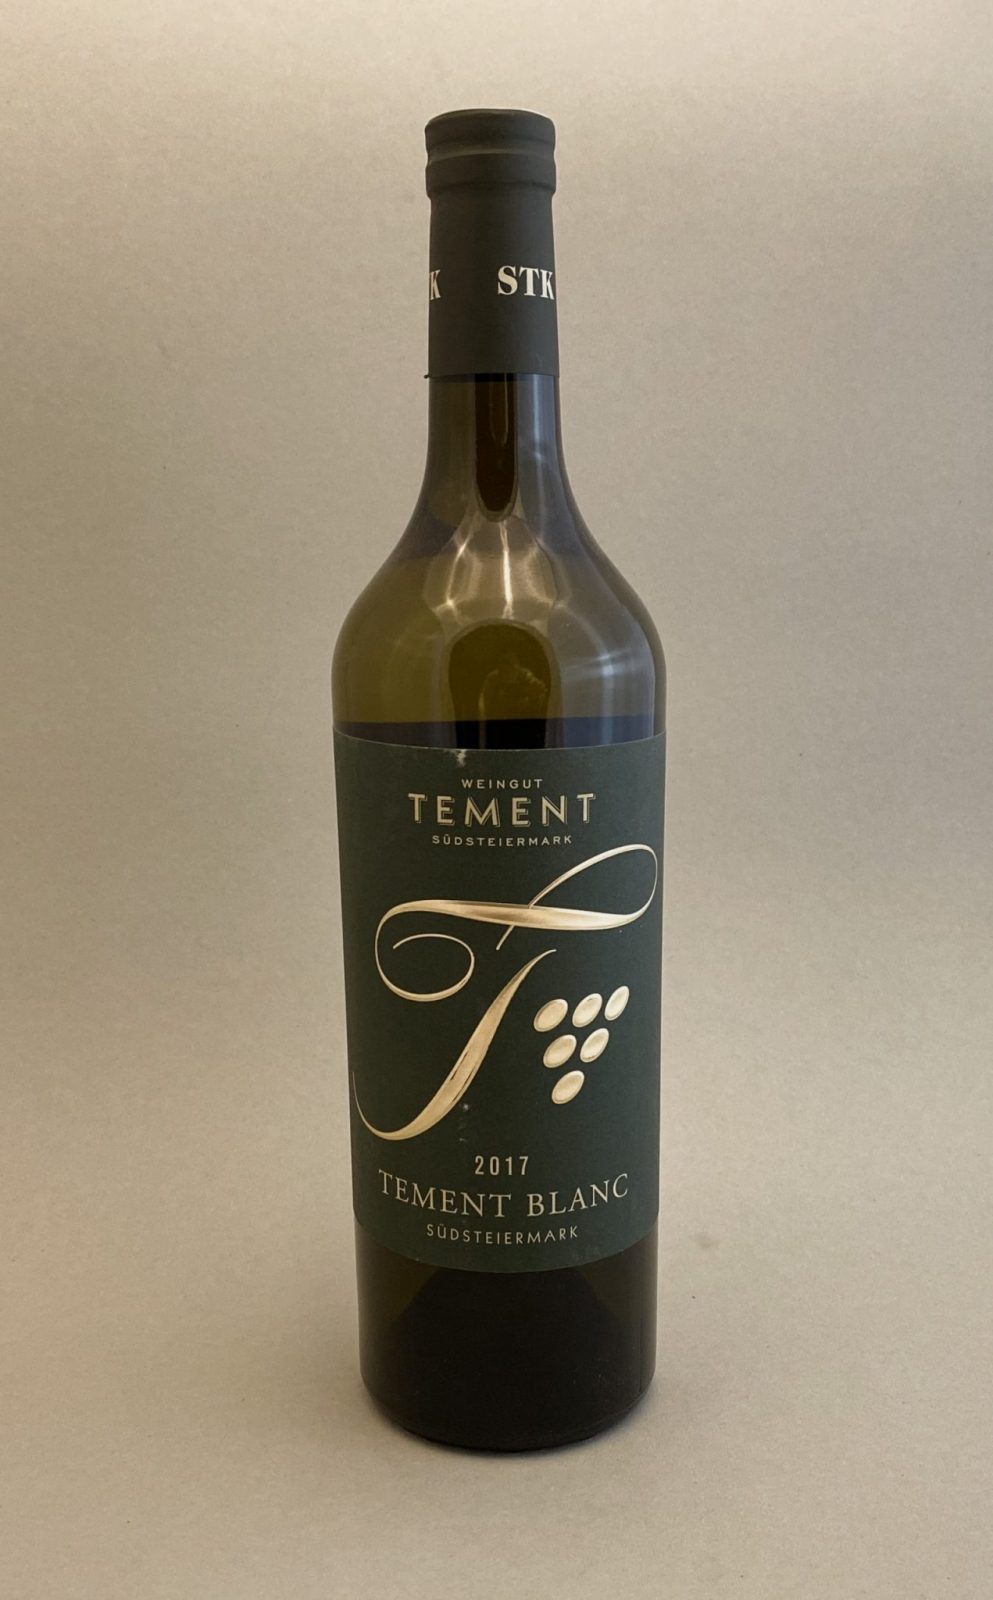 WEINGUT Tement Blanc 2017, vinoteka Sunny wines slnecnice mesto, Bratislava petrzalka, vino biele z Rakúska